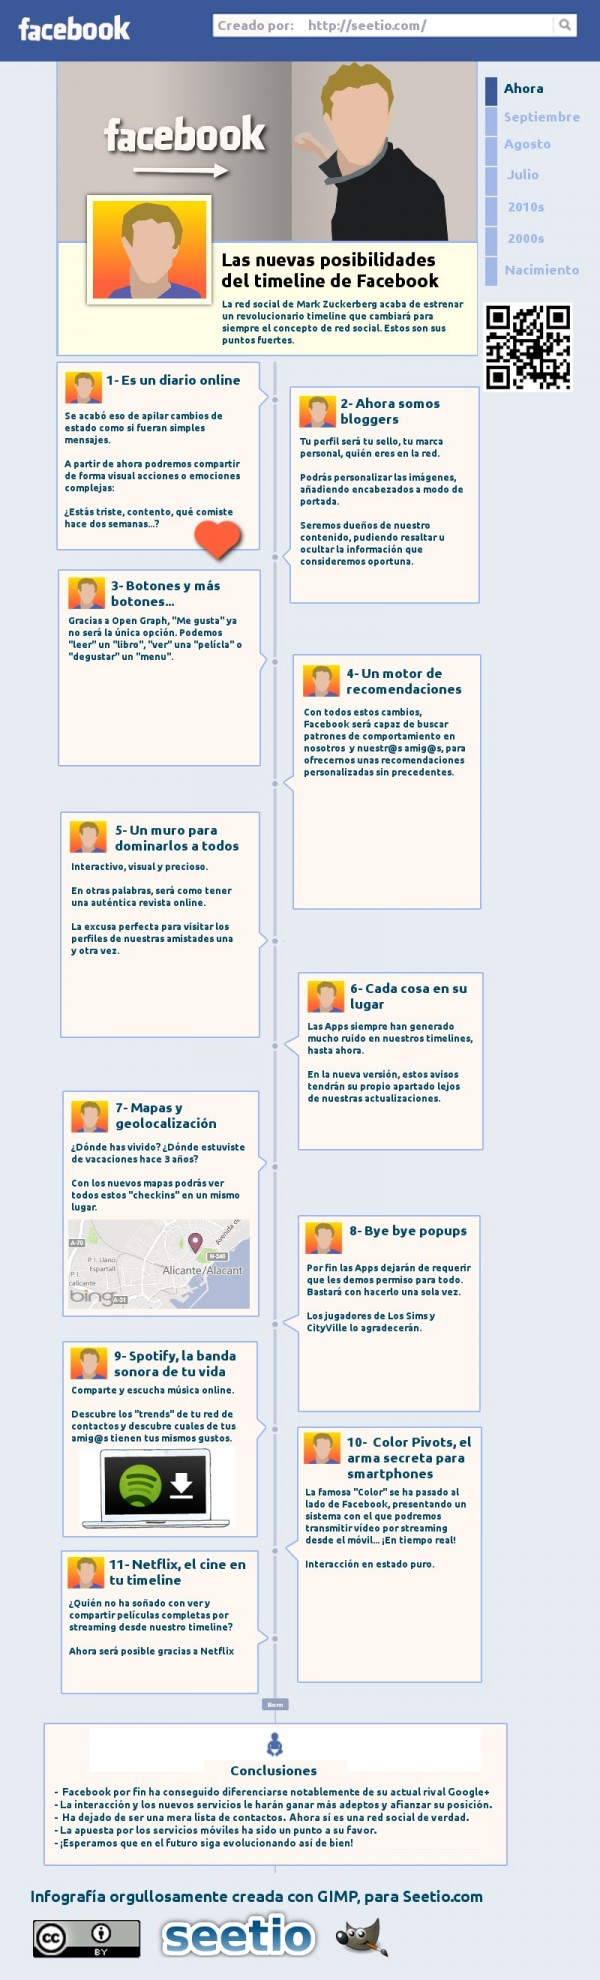 infografia-timeline-facebok-600x1980